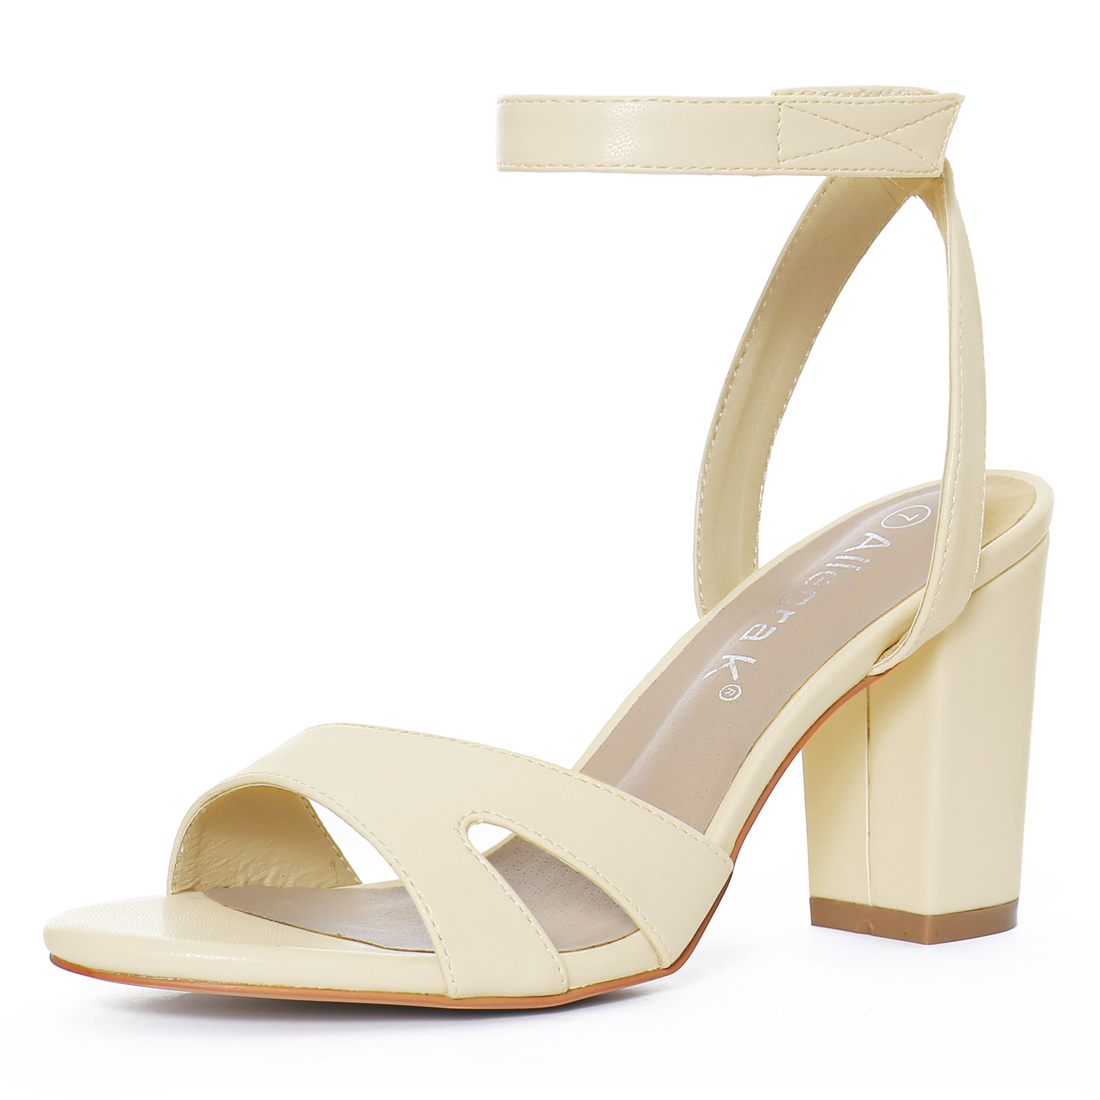 Women Open Toe Block High Heels Ankle Strap Sandals Off White US 10